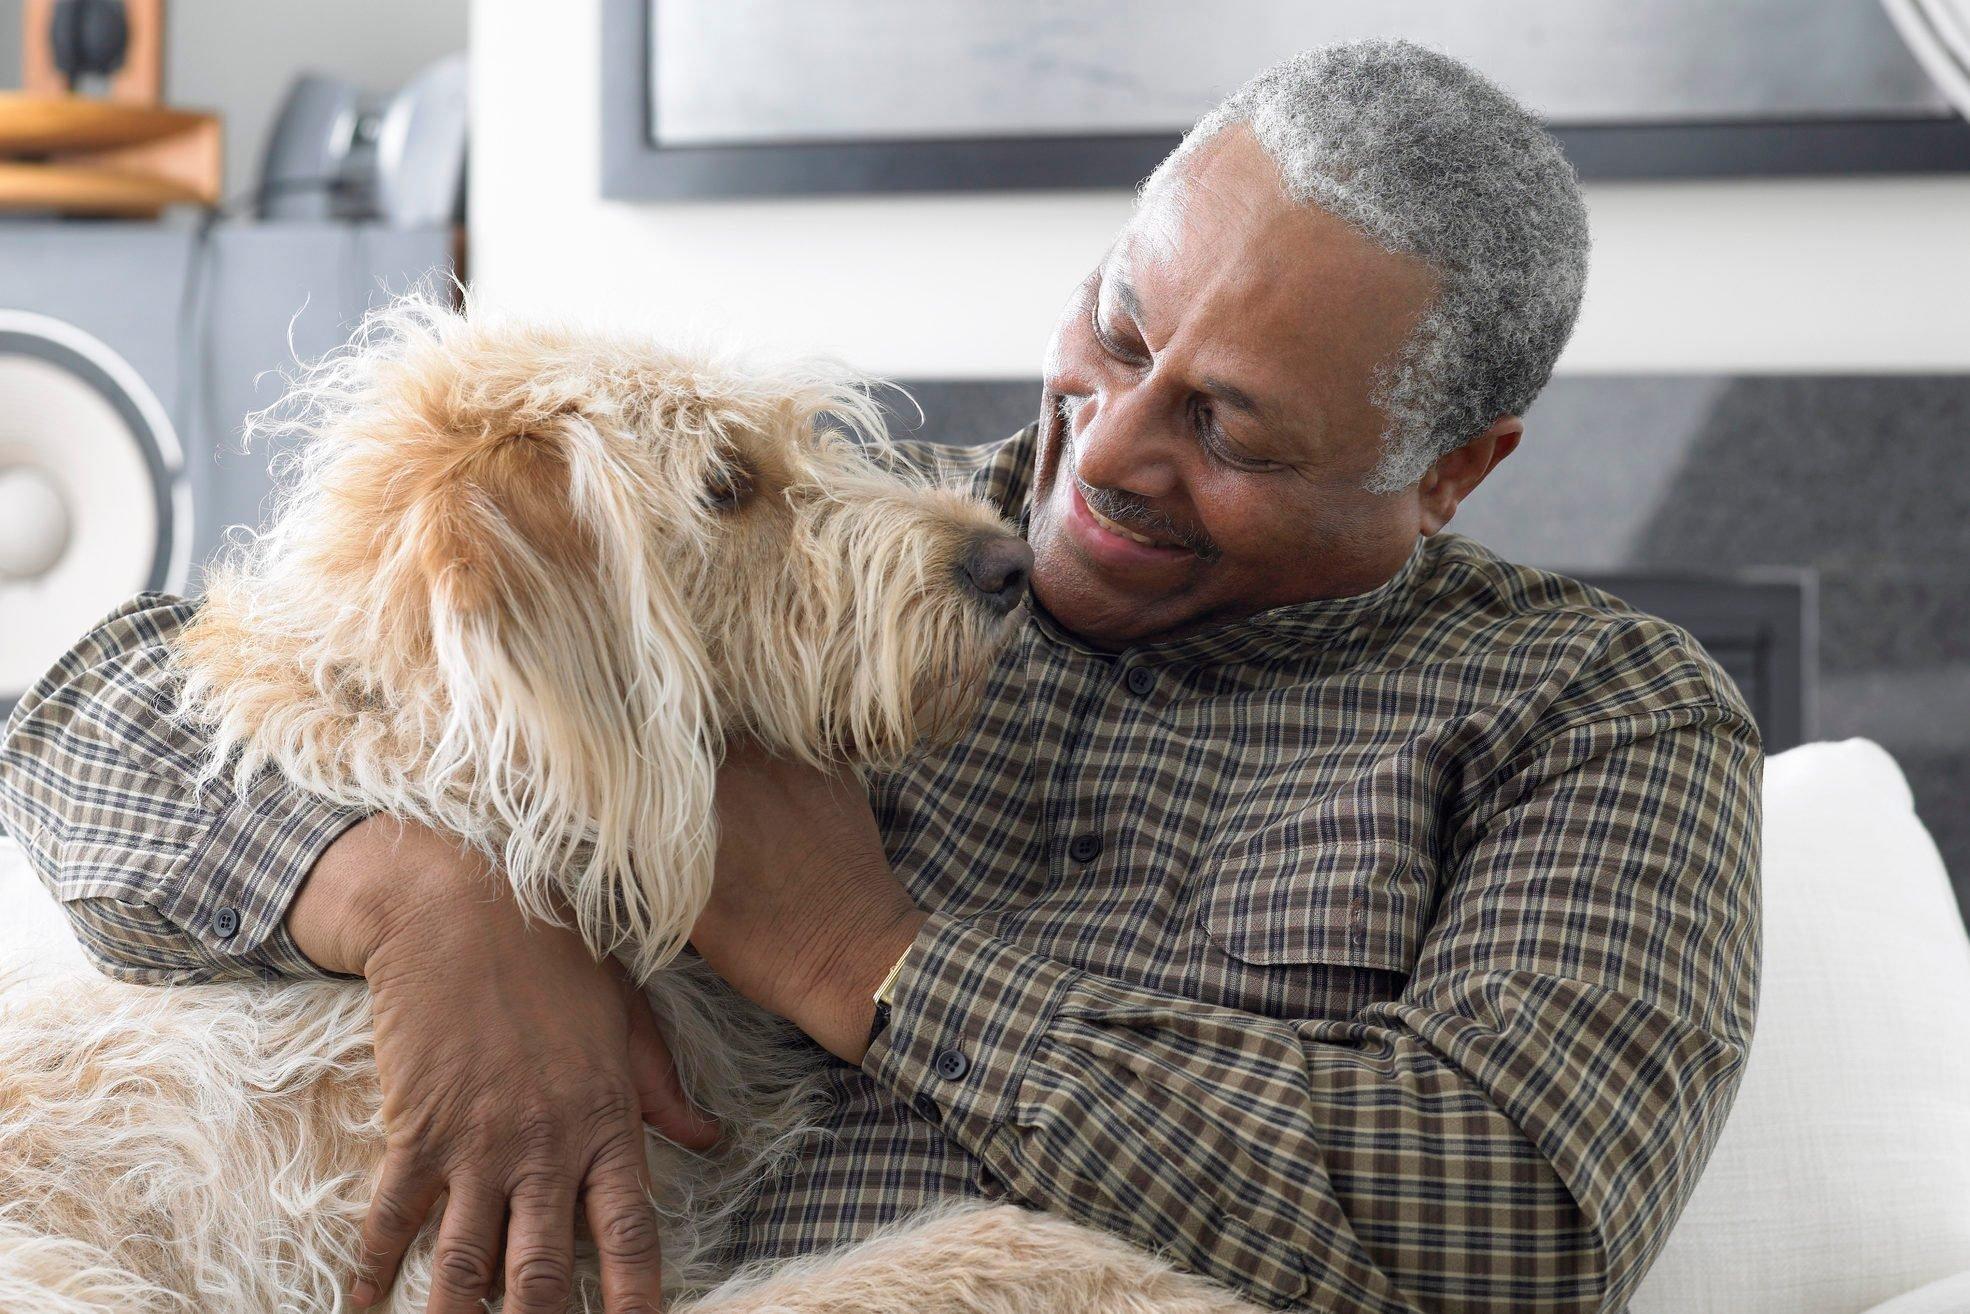 Senior man sitting on sofa, playing with dog, close-up